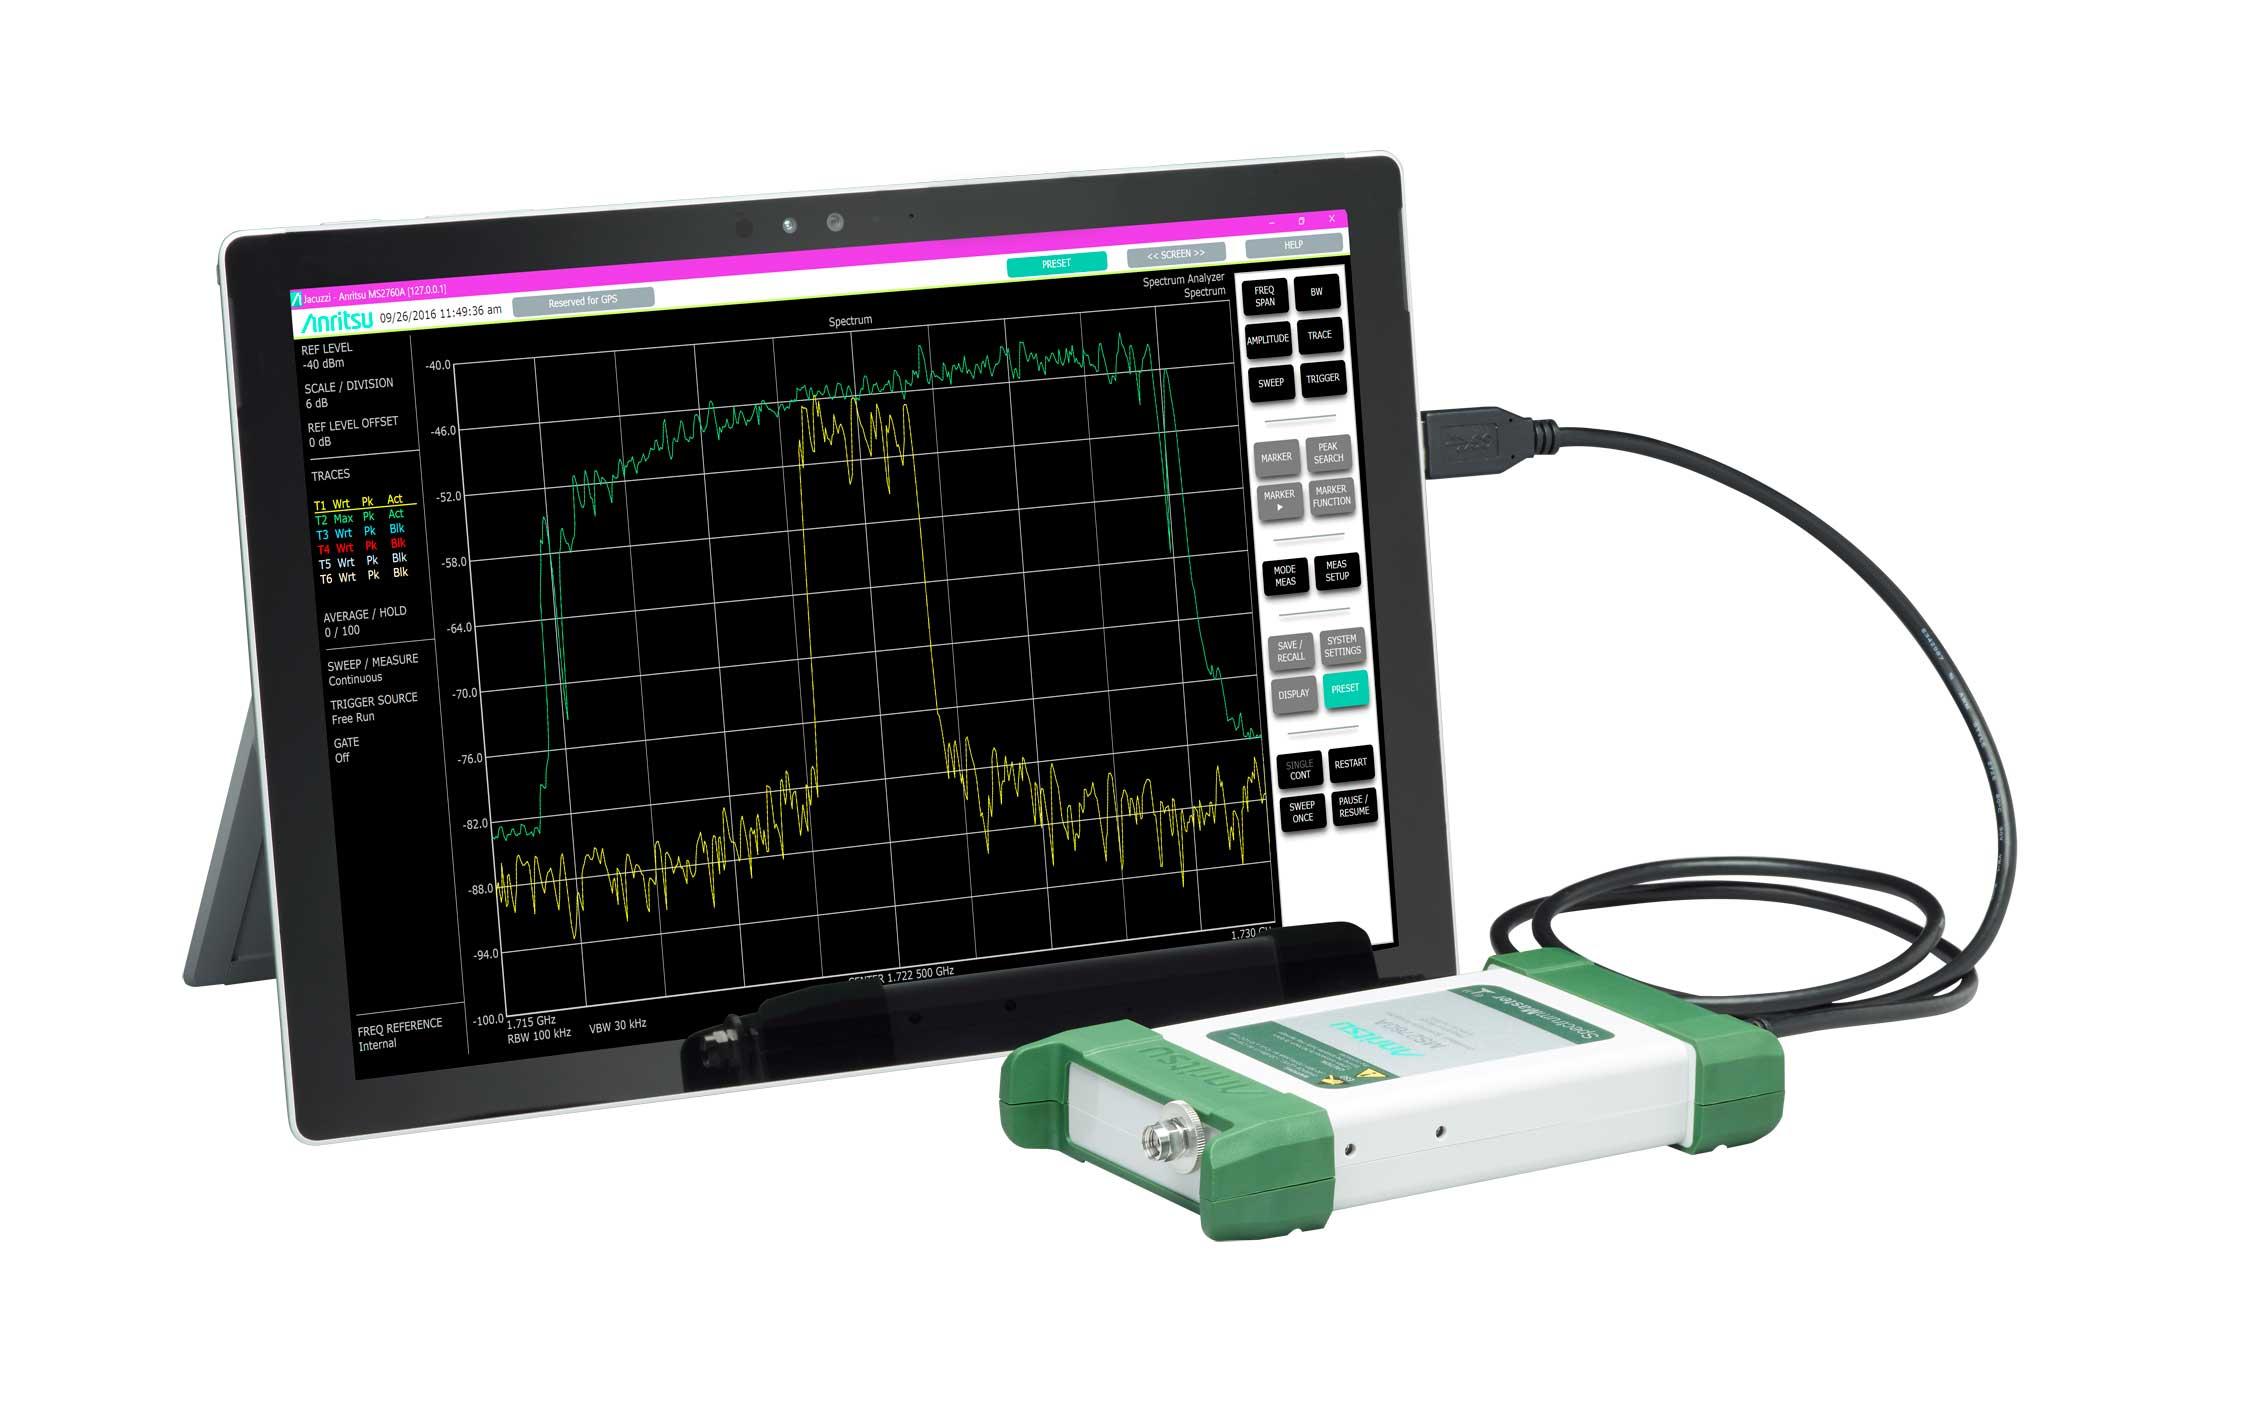 Анализатор спектра Anritsu MS2760A-0050